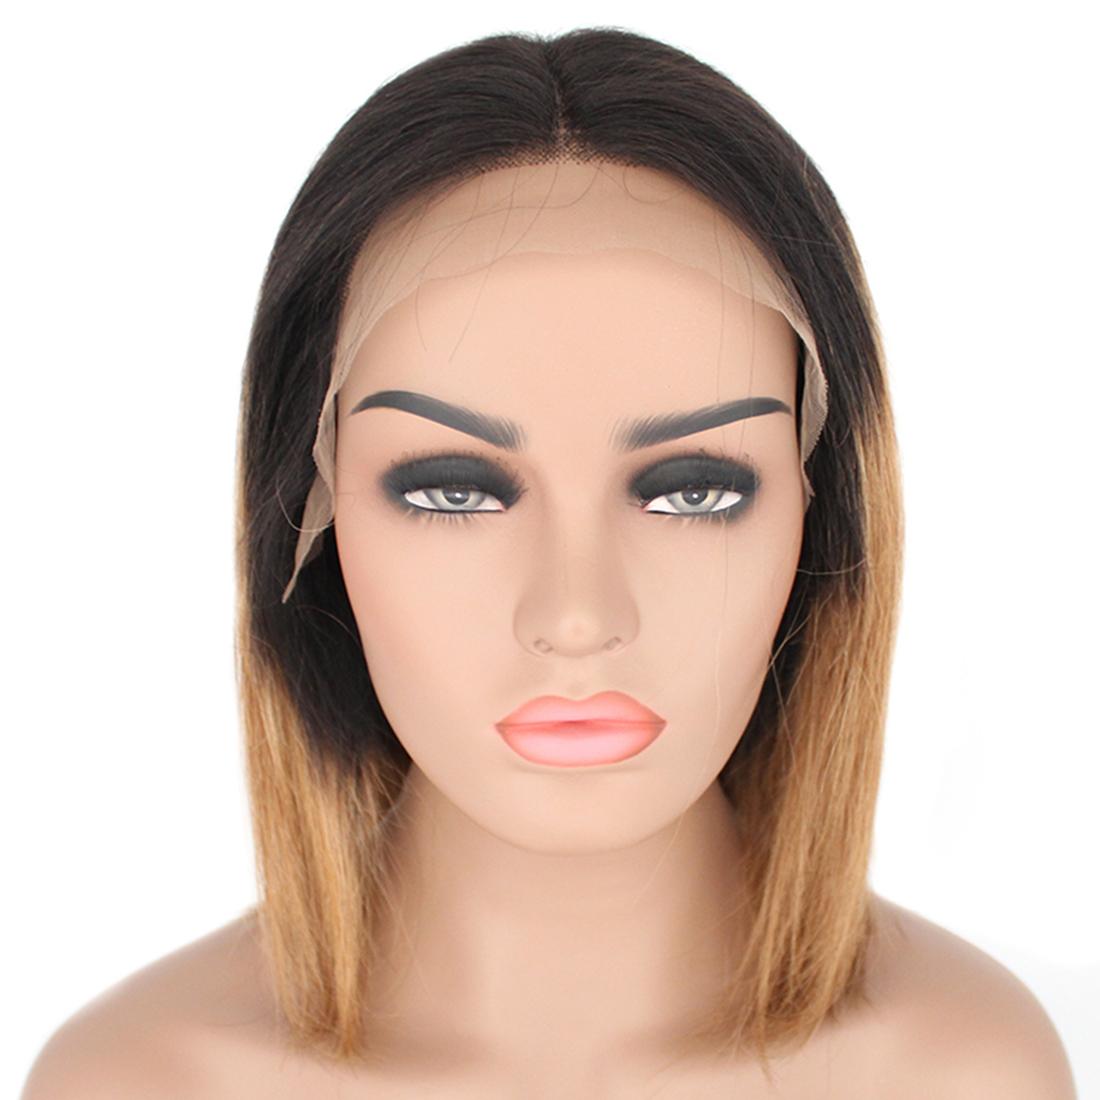 1bt27 bob ombre lace front wig 09